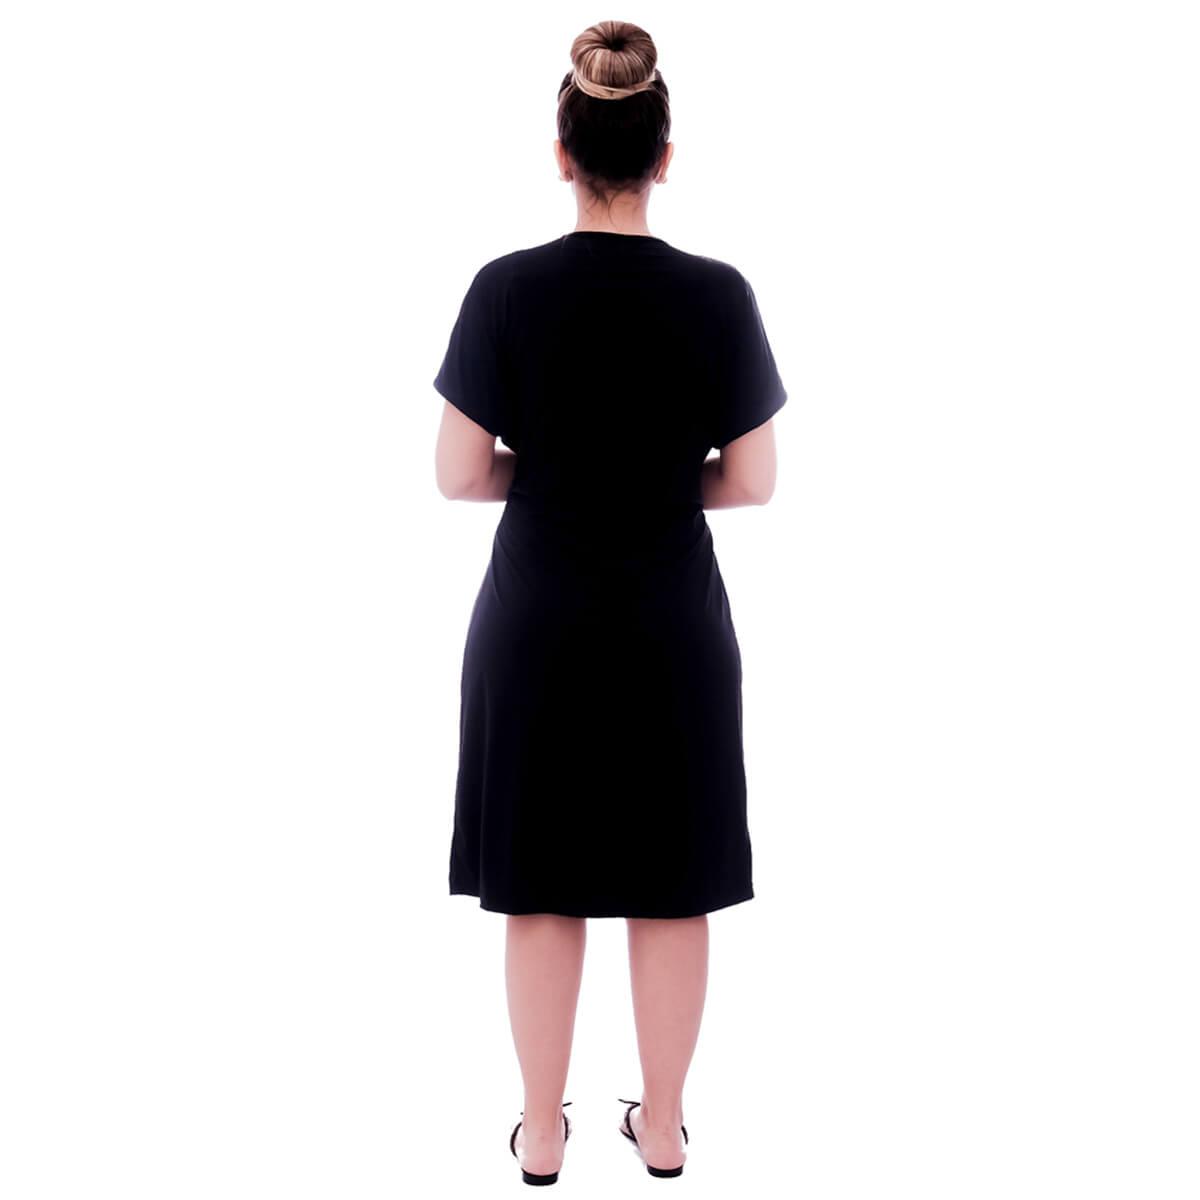 Robe Feminino de Manga Curta Preto com Viés